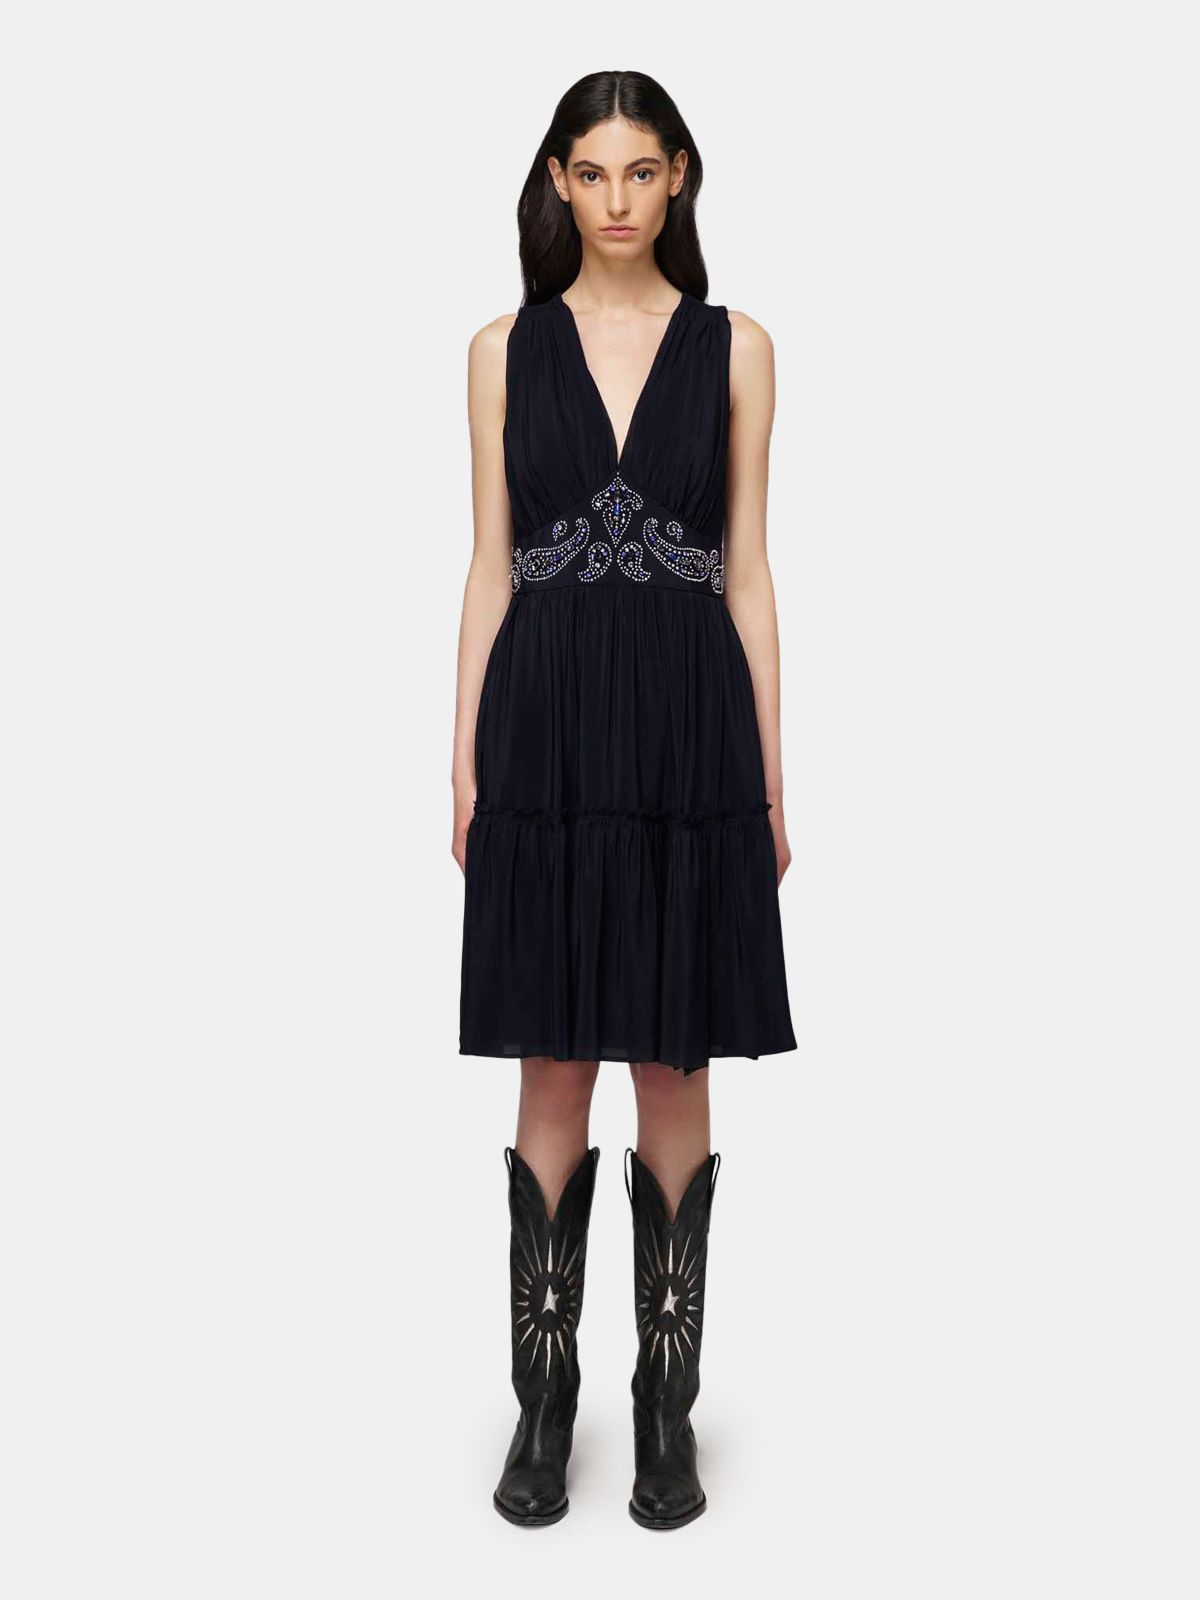 Golden Goose - Black silk Aubree dress with decorative studs in